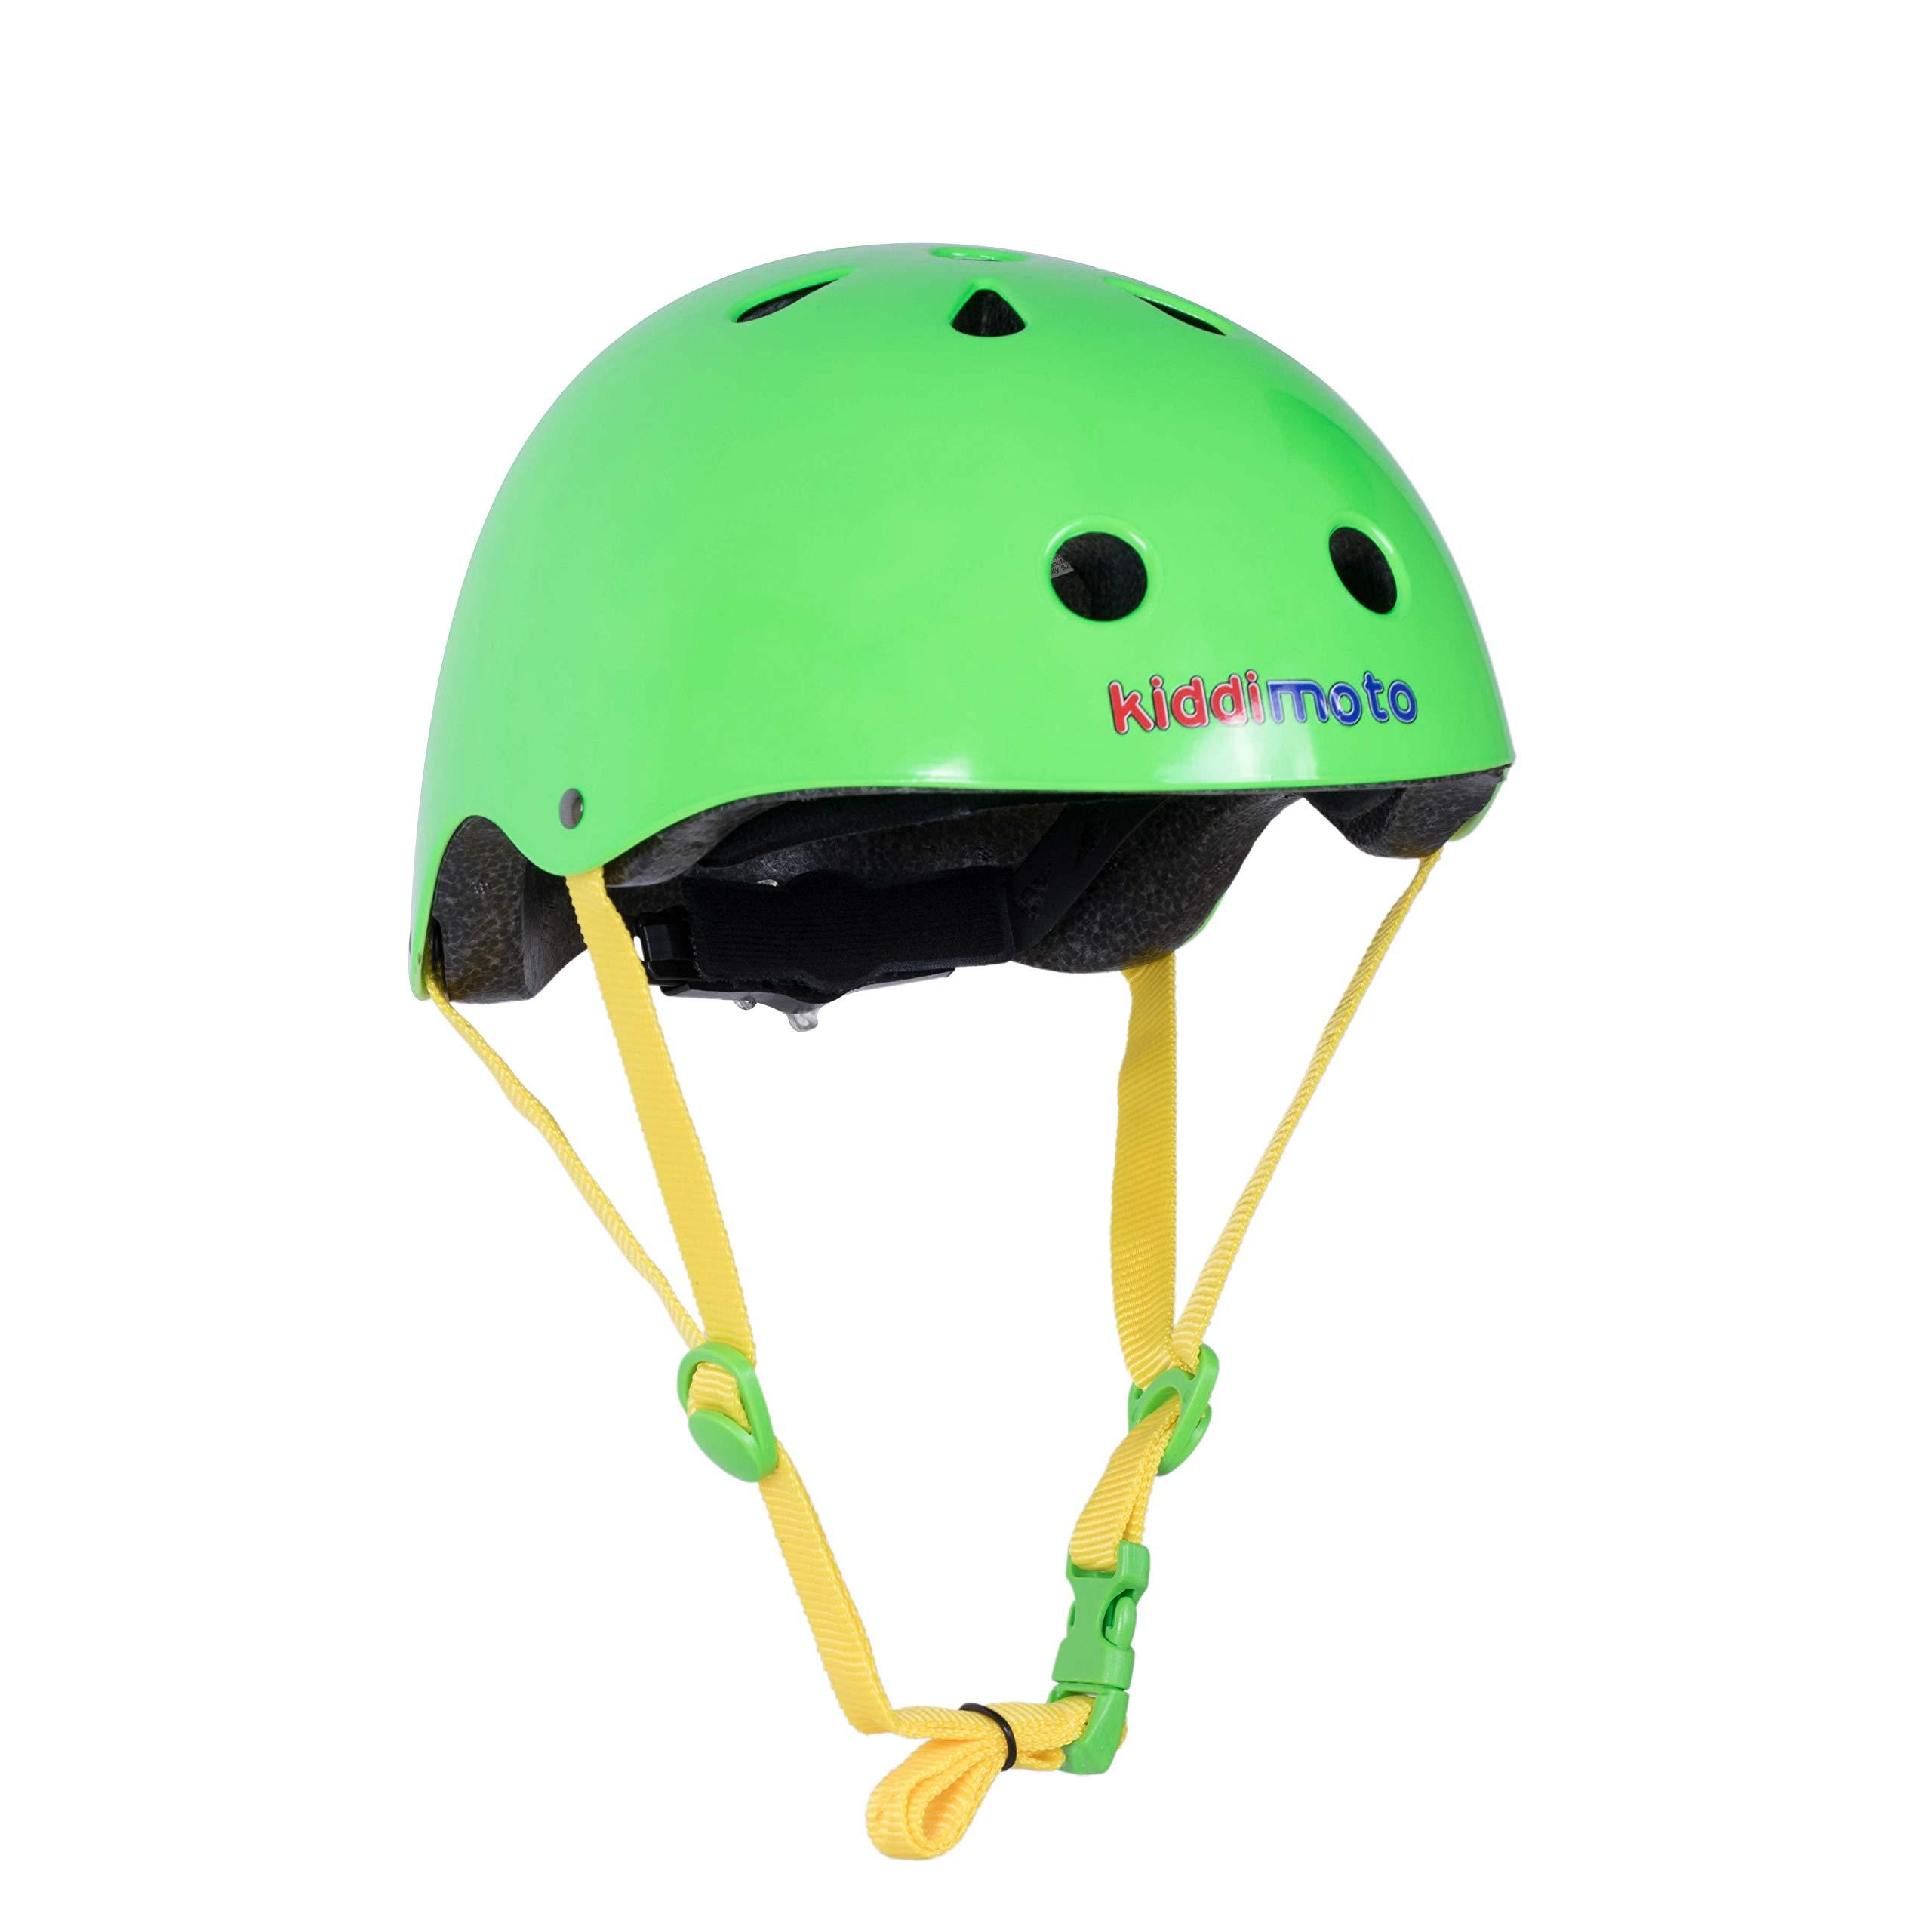 Kiddimoto Helmet, Neon Green, Small (48-53 cm)